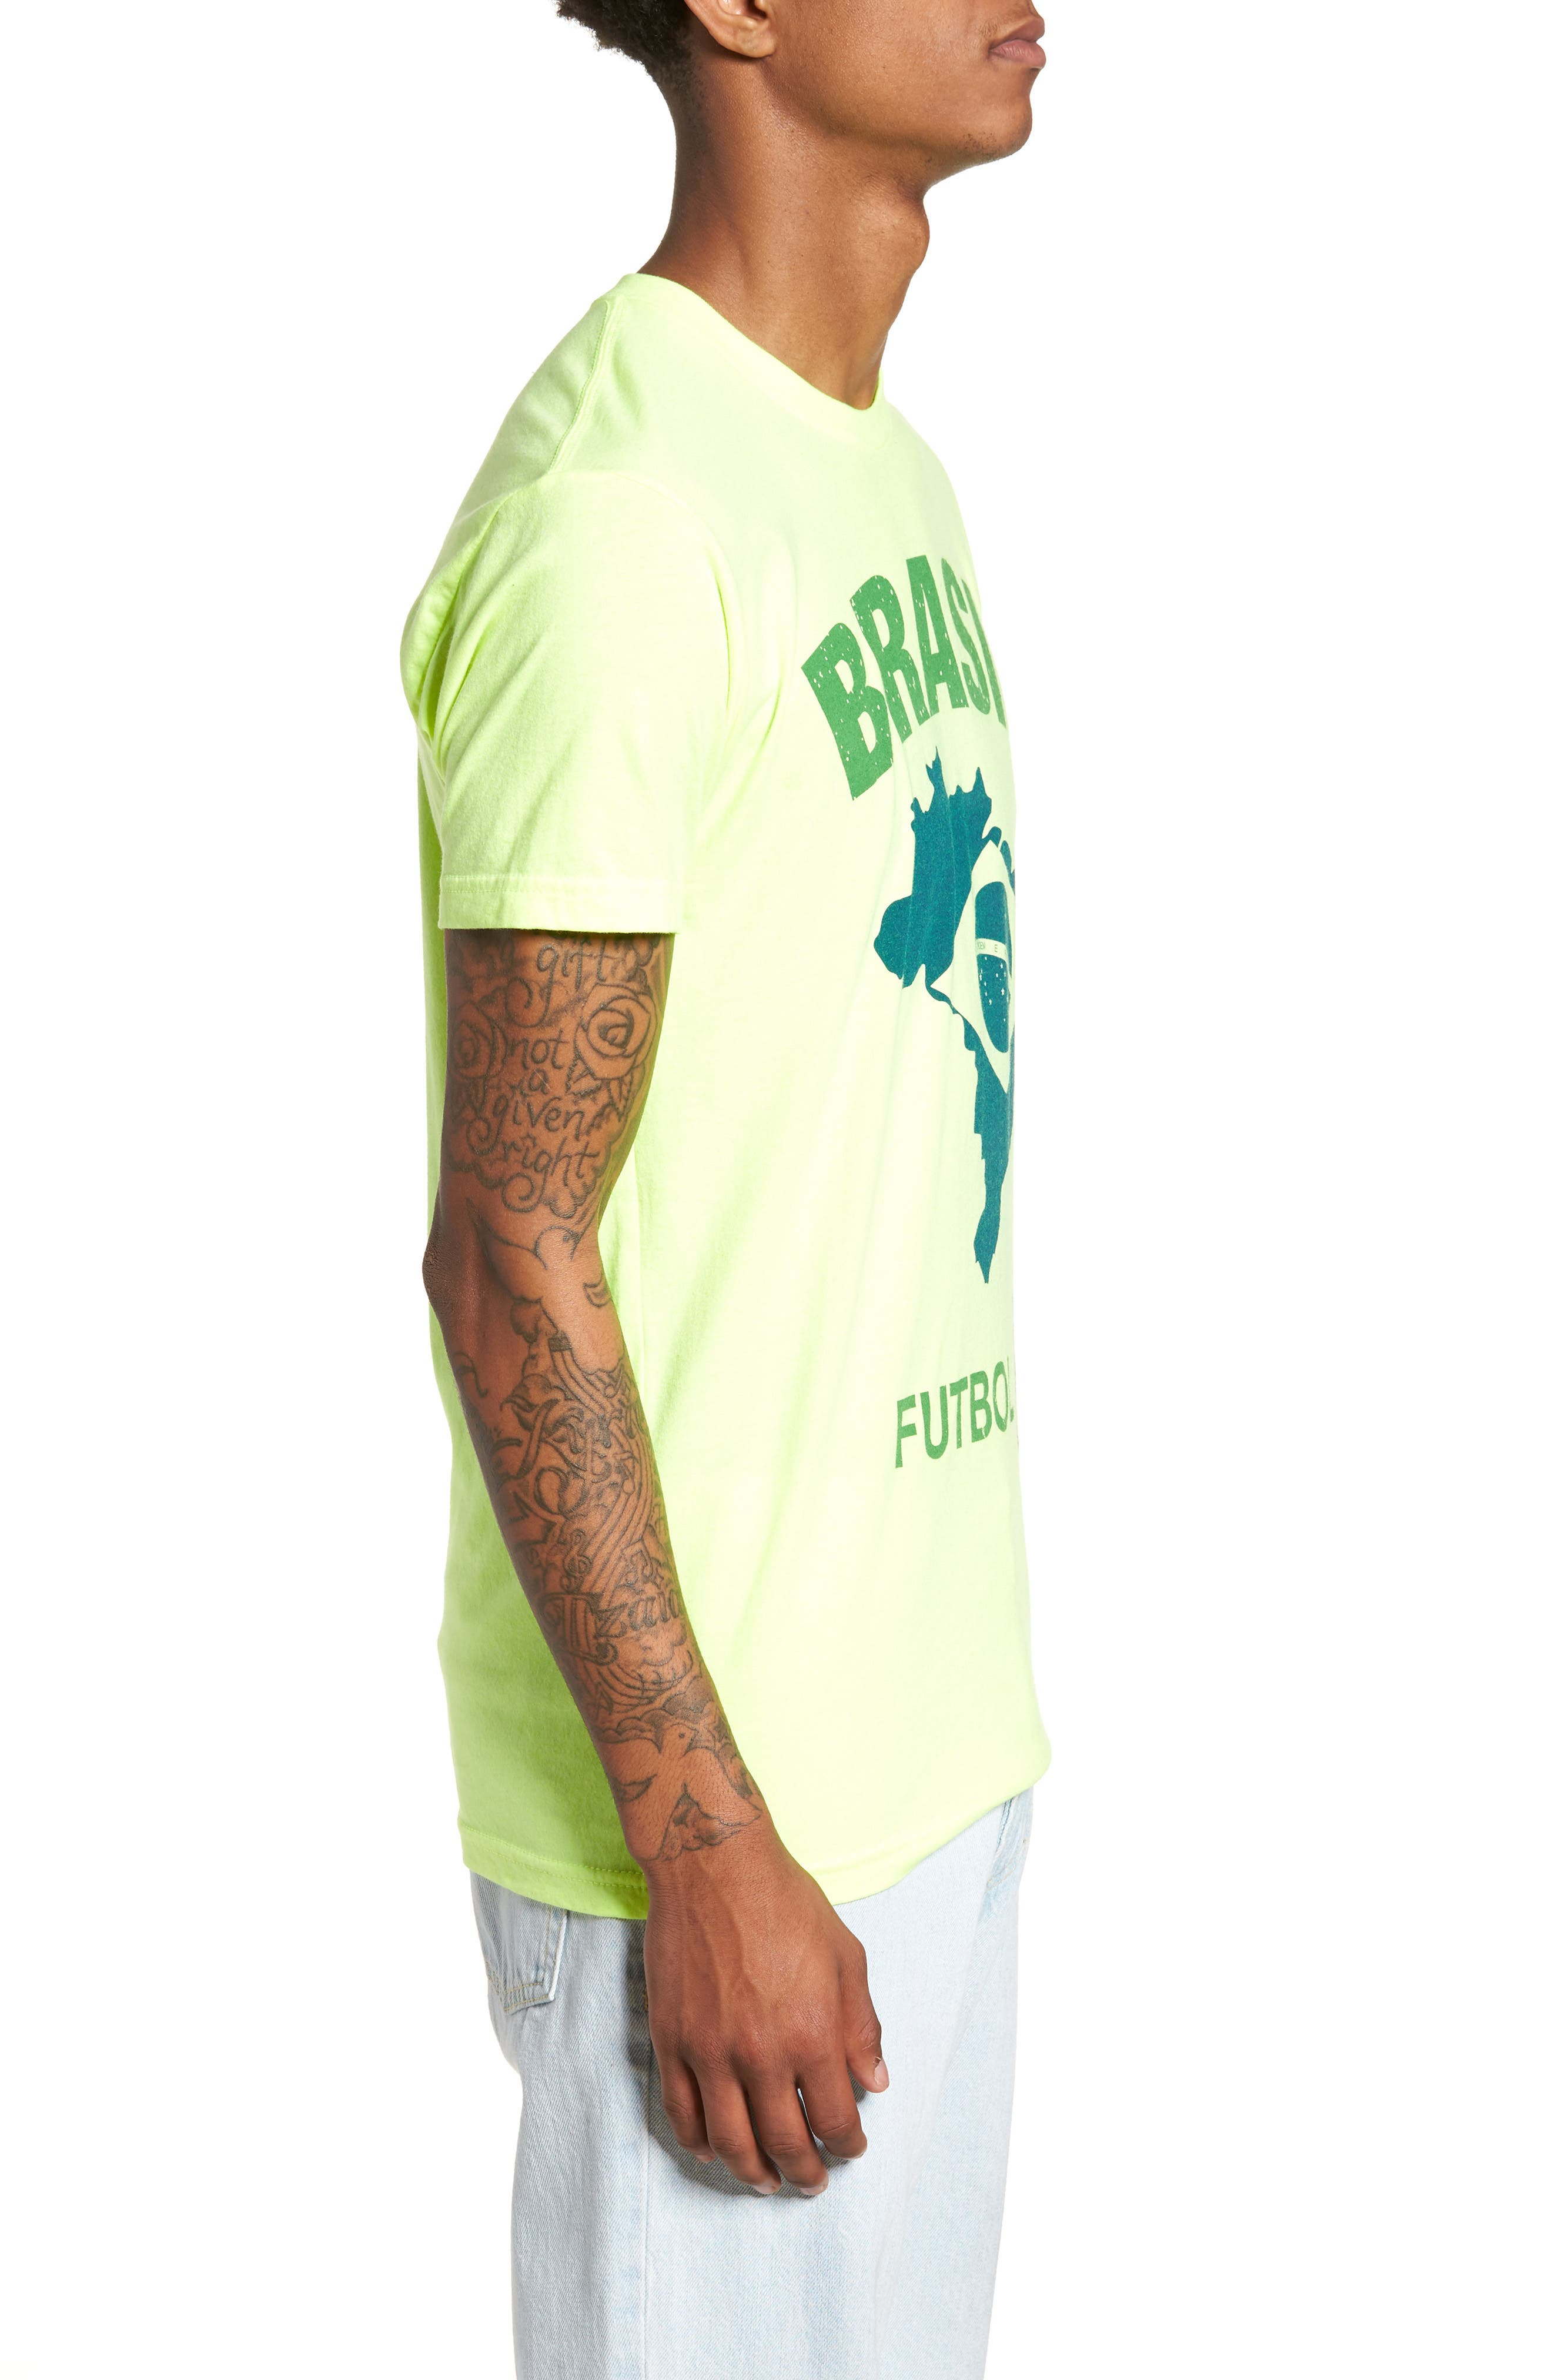 Brasil Futbol T-Shirt,                             Alternate thumbnail 3, color,                             700